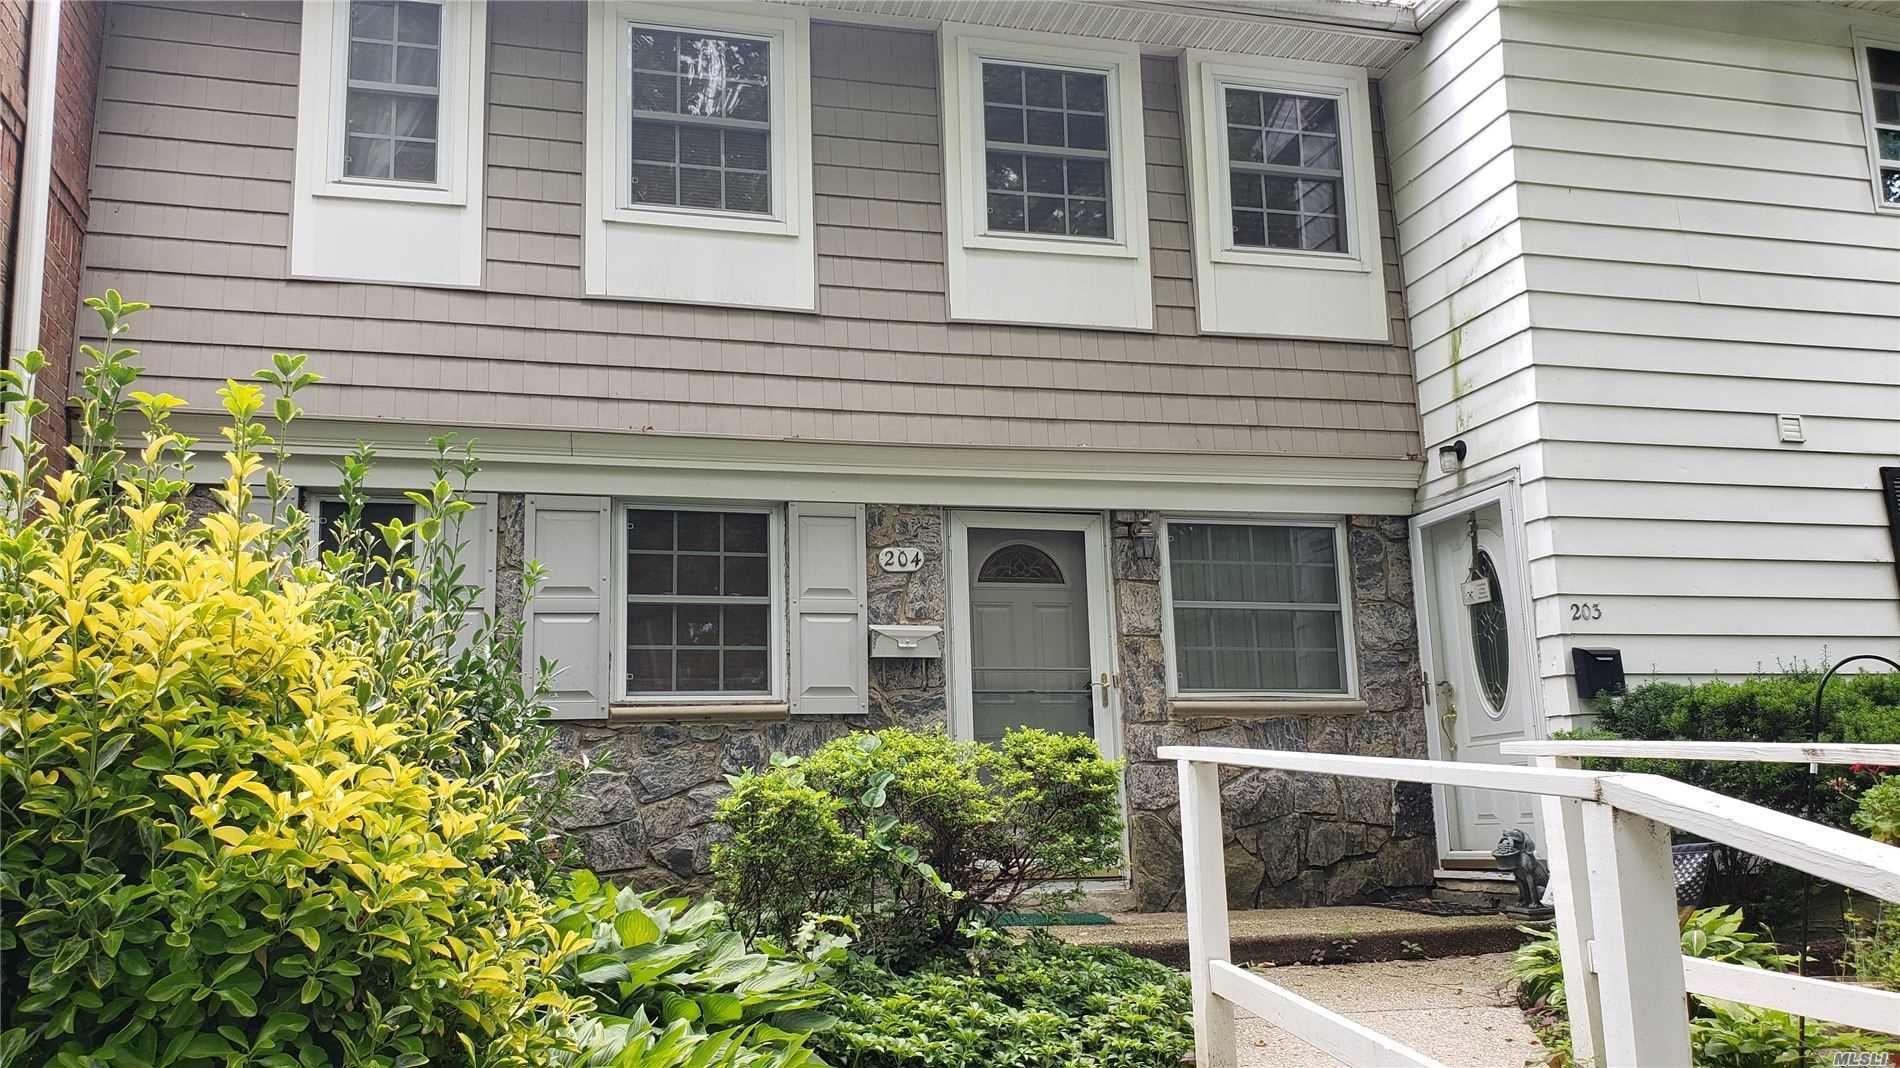 204 Towne House Vill Vlg, Hauppauge, NY 11749 - MLS#: 3229538